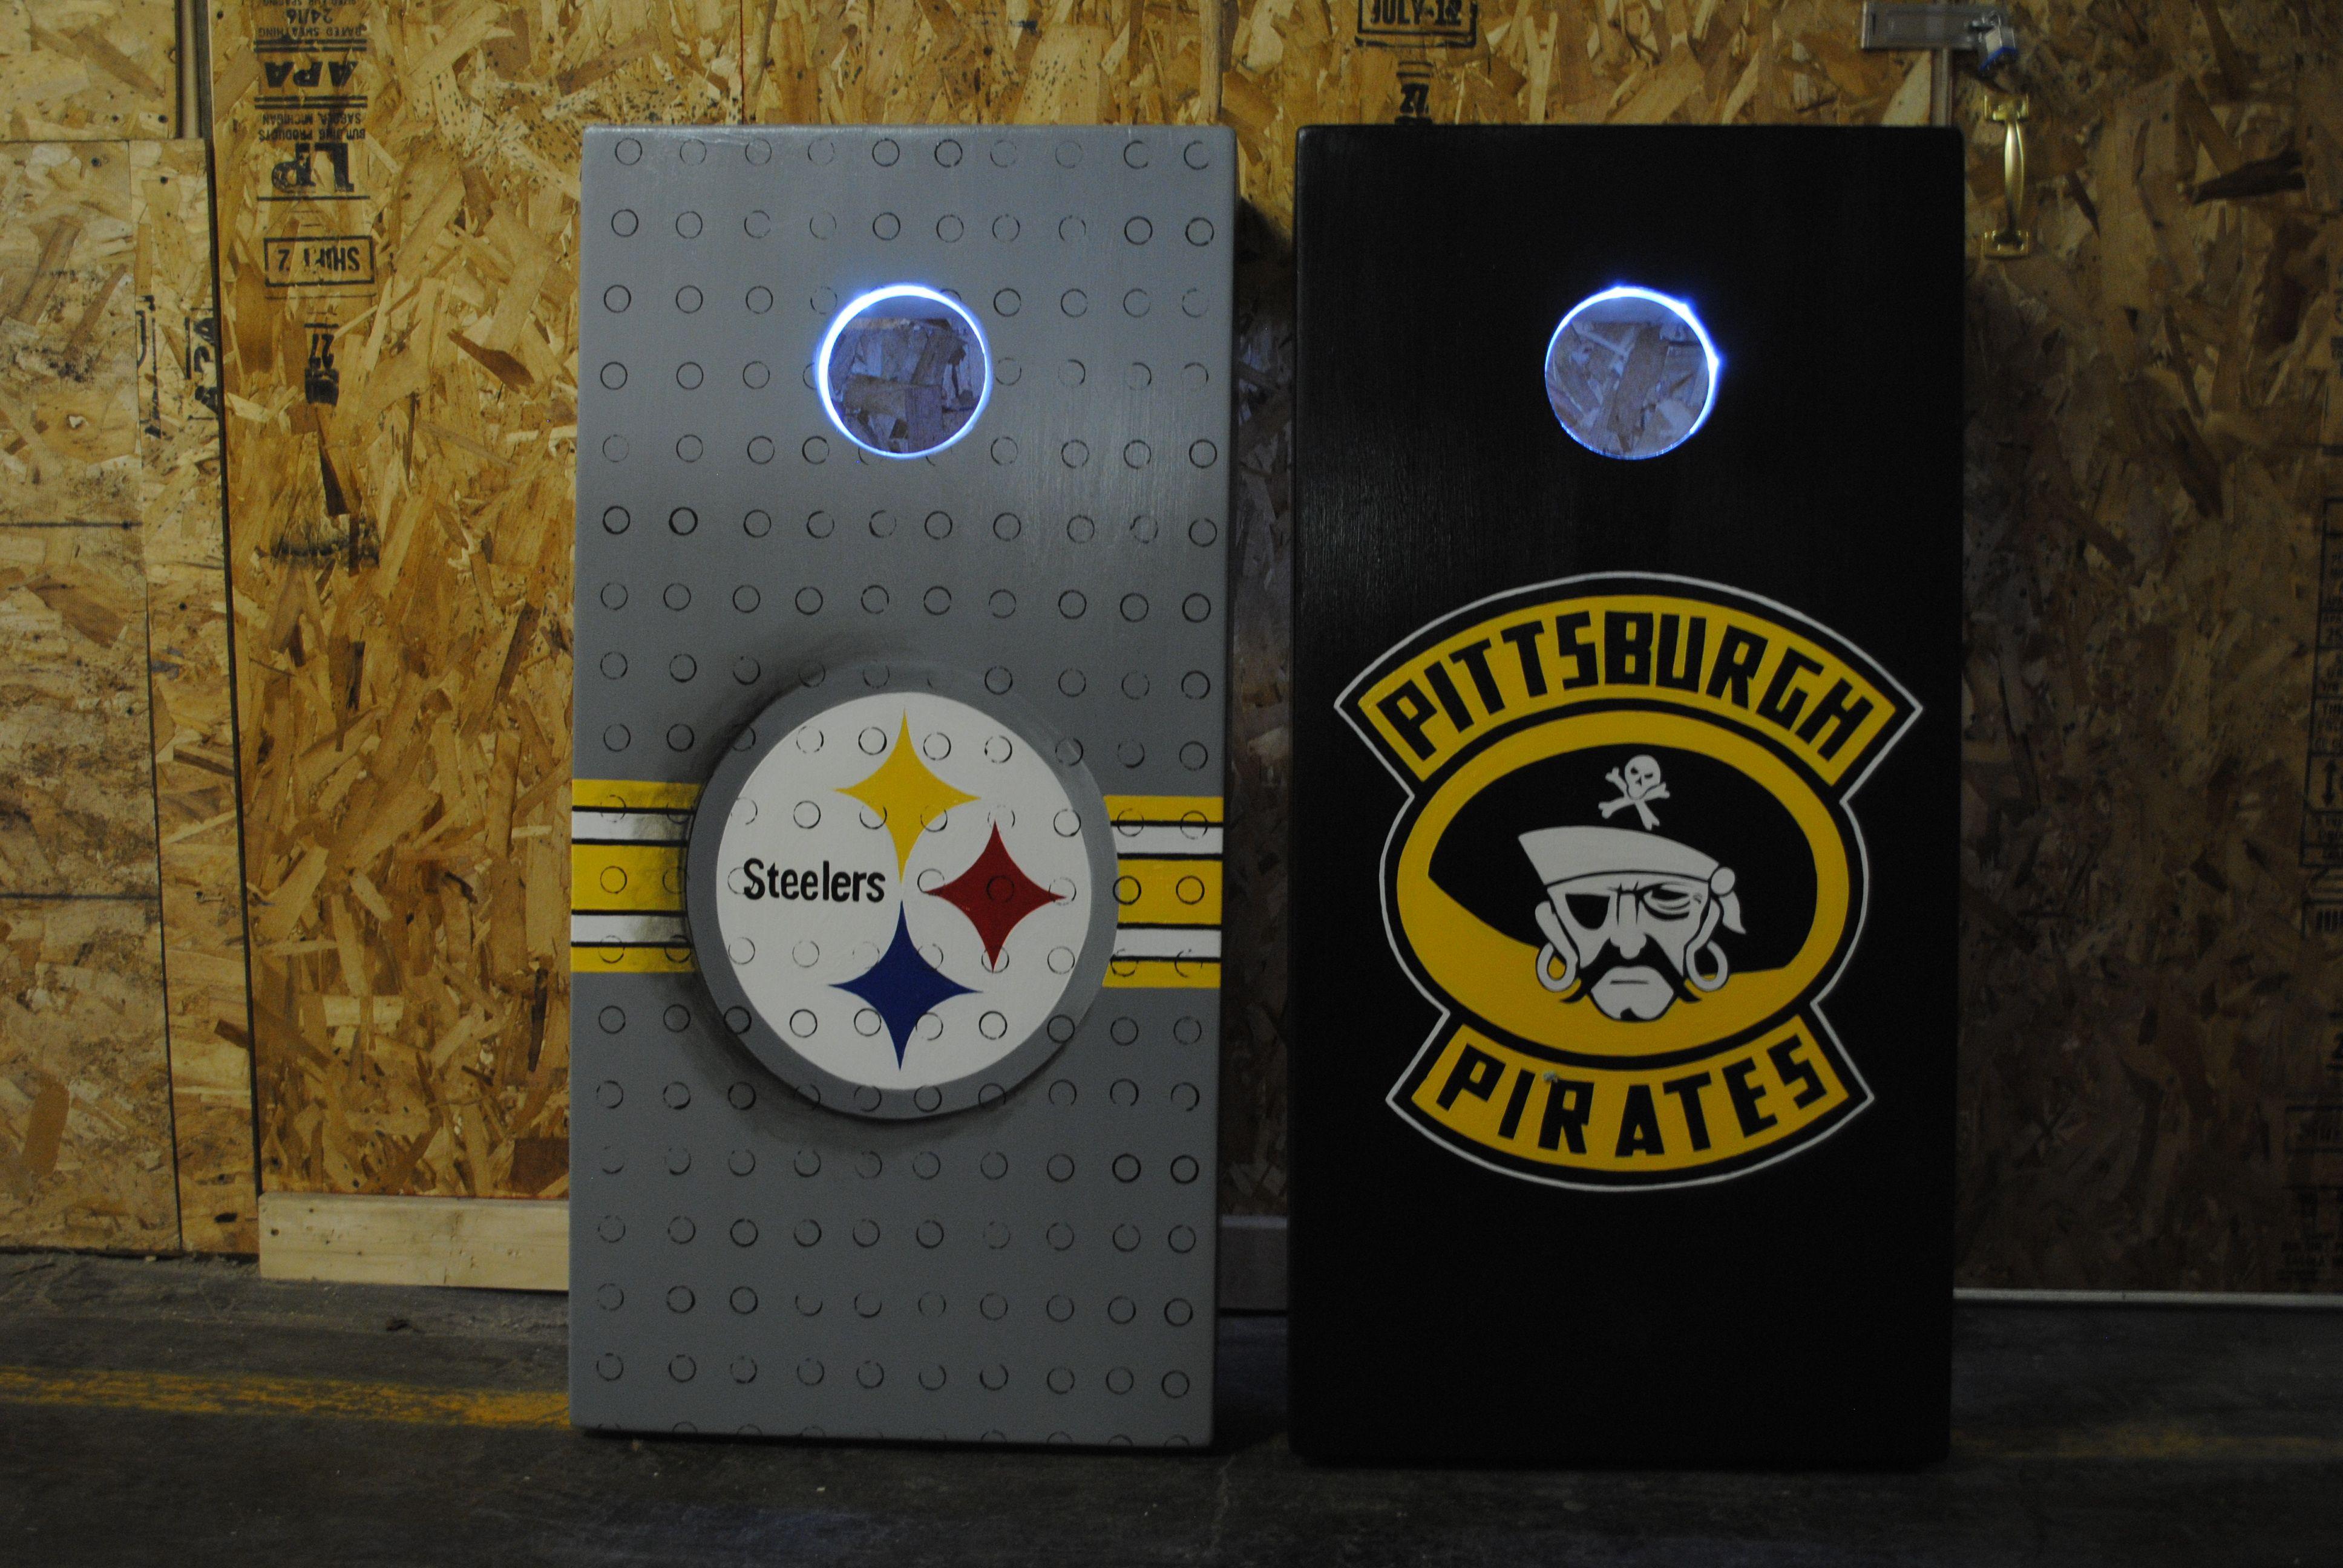 Pitt Steelers, Pitt Pirates custom cornhole game board bag set!  Lights, drink holder and bags!